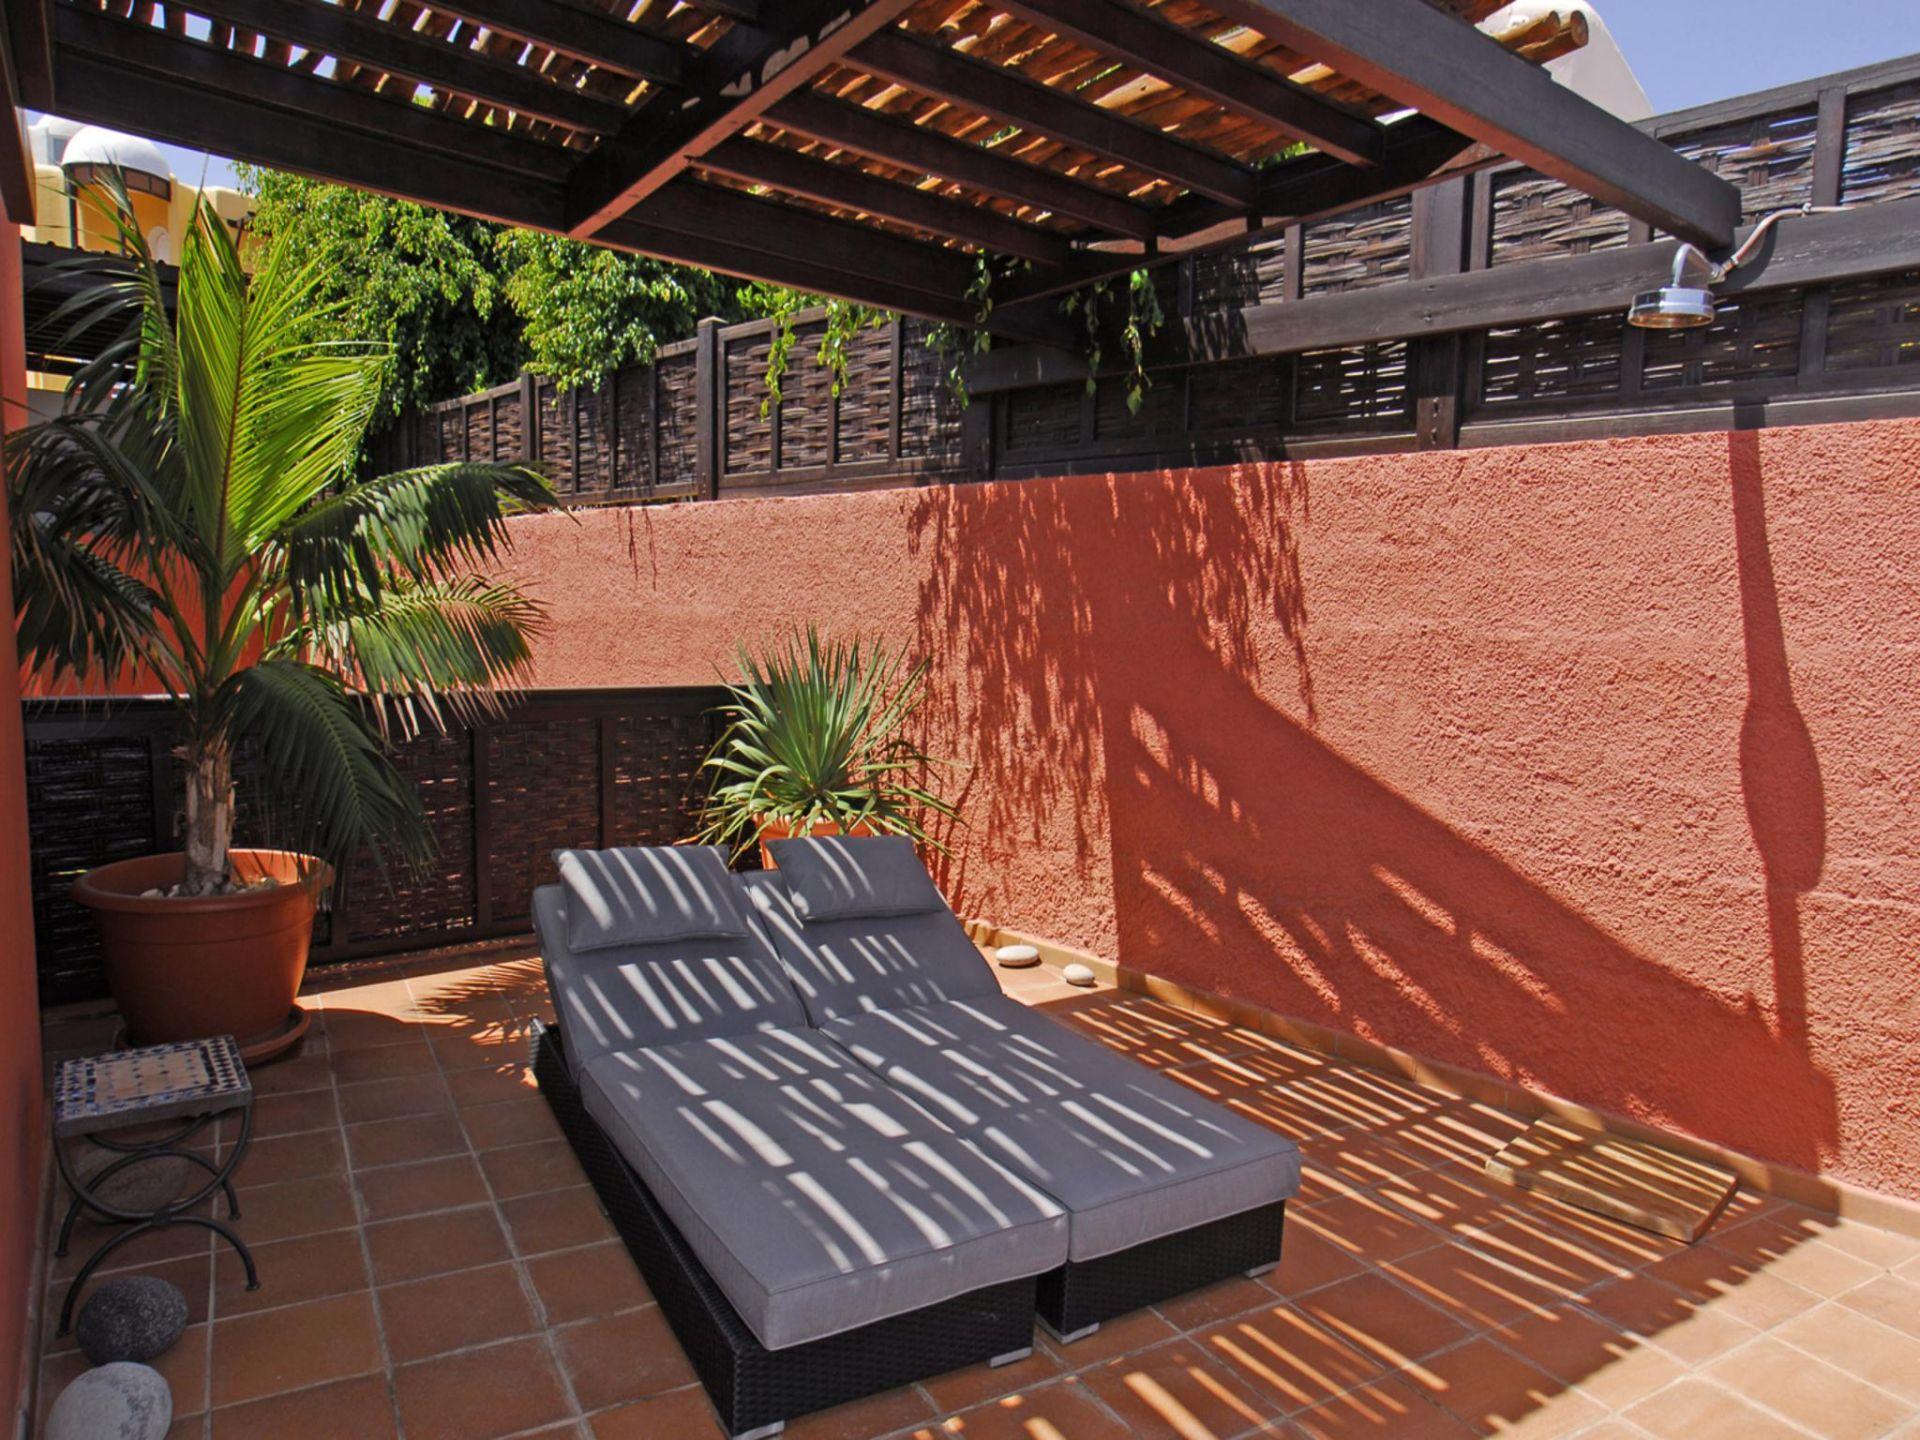 Holiday apartment Villa San Agustin 10 - Holiday Rental (854295), Maspalomas, Gran Canaria, Canary Islands, Spain, picture 7